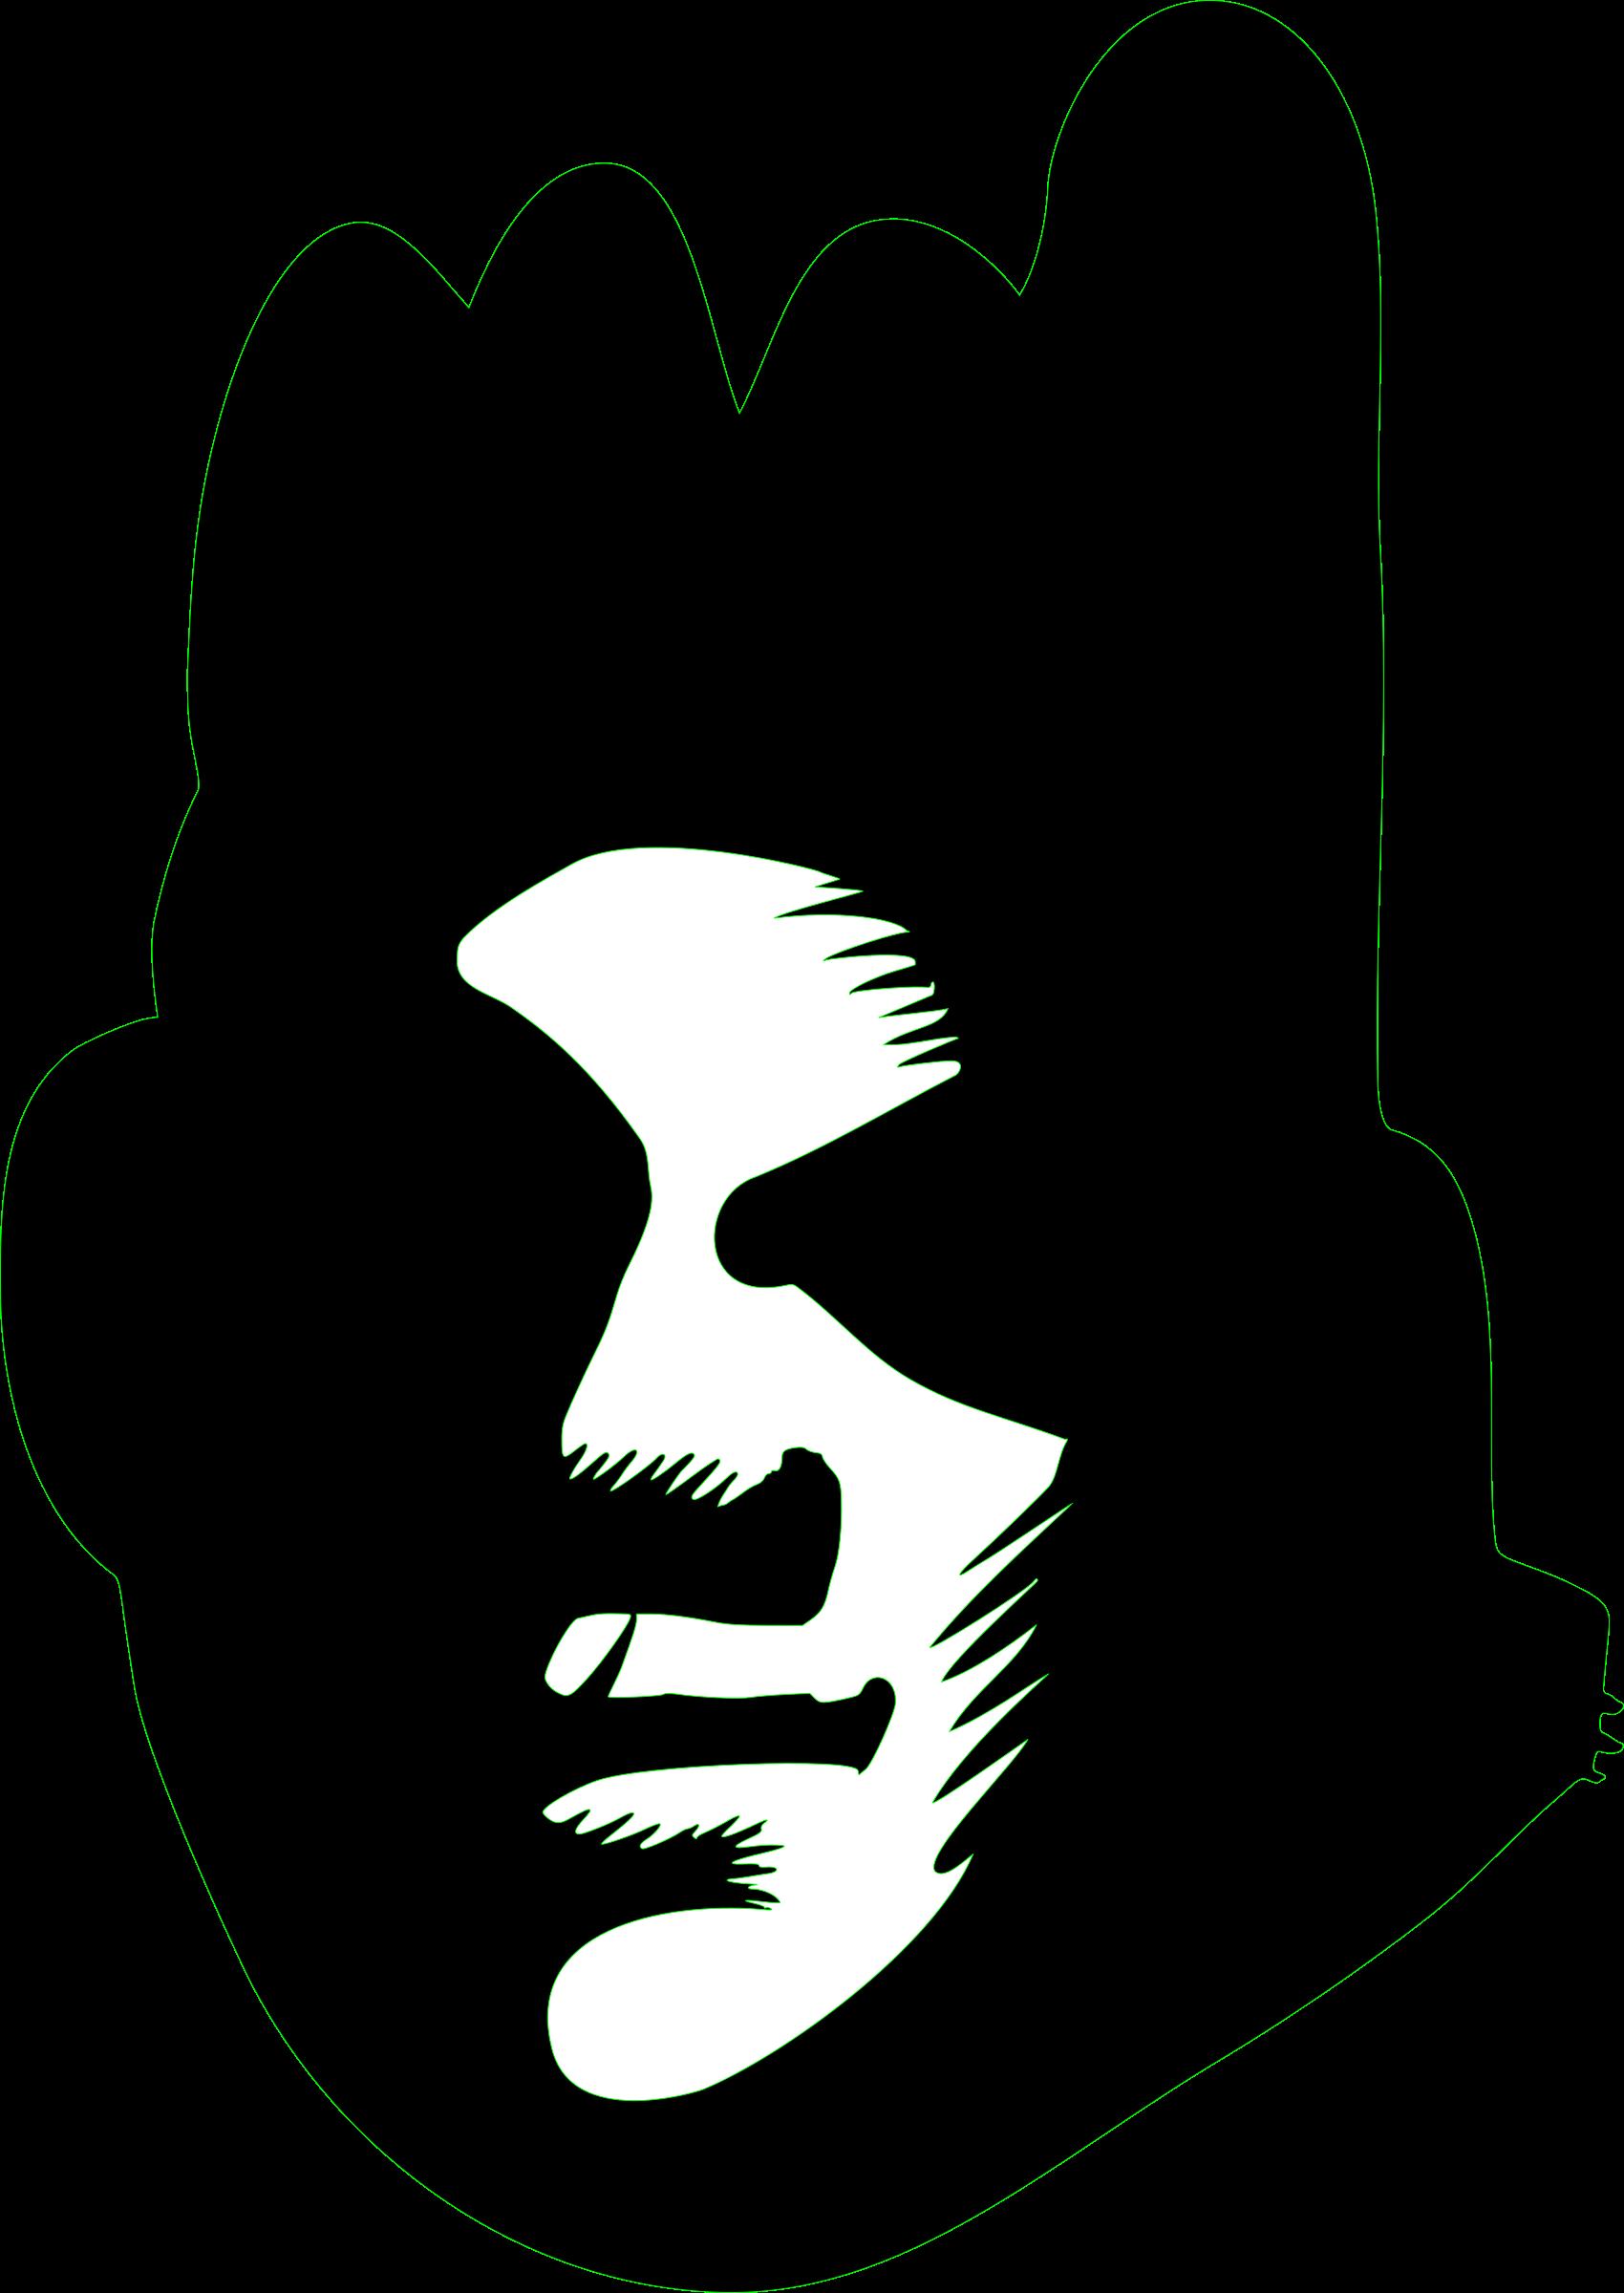 Black face big image. Graffiti clipart design